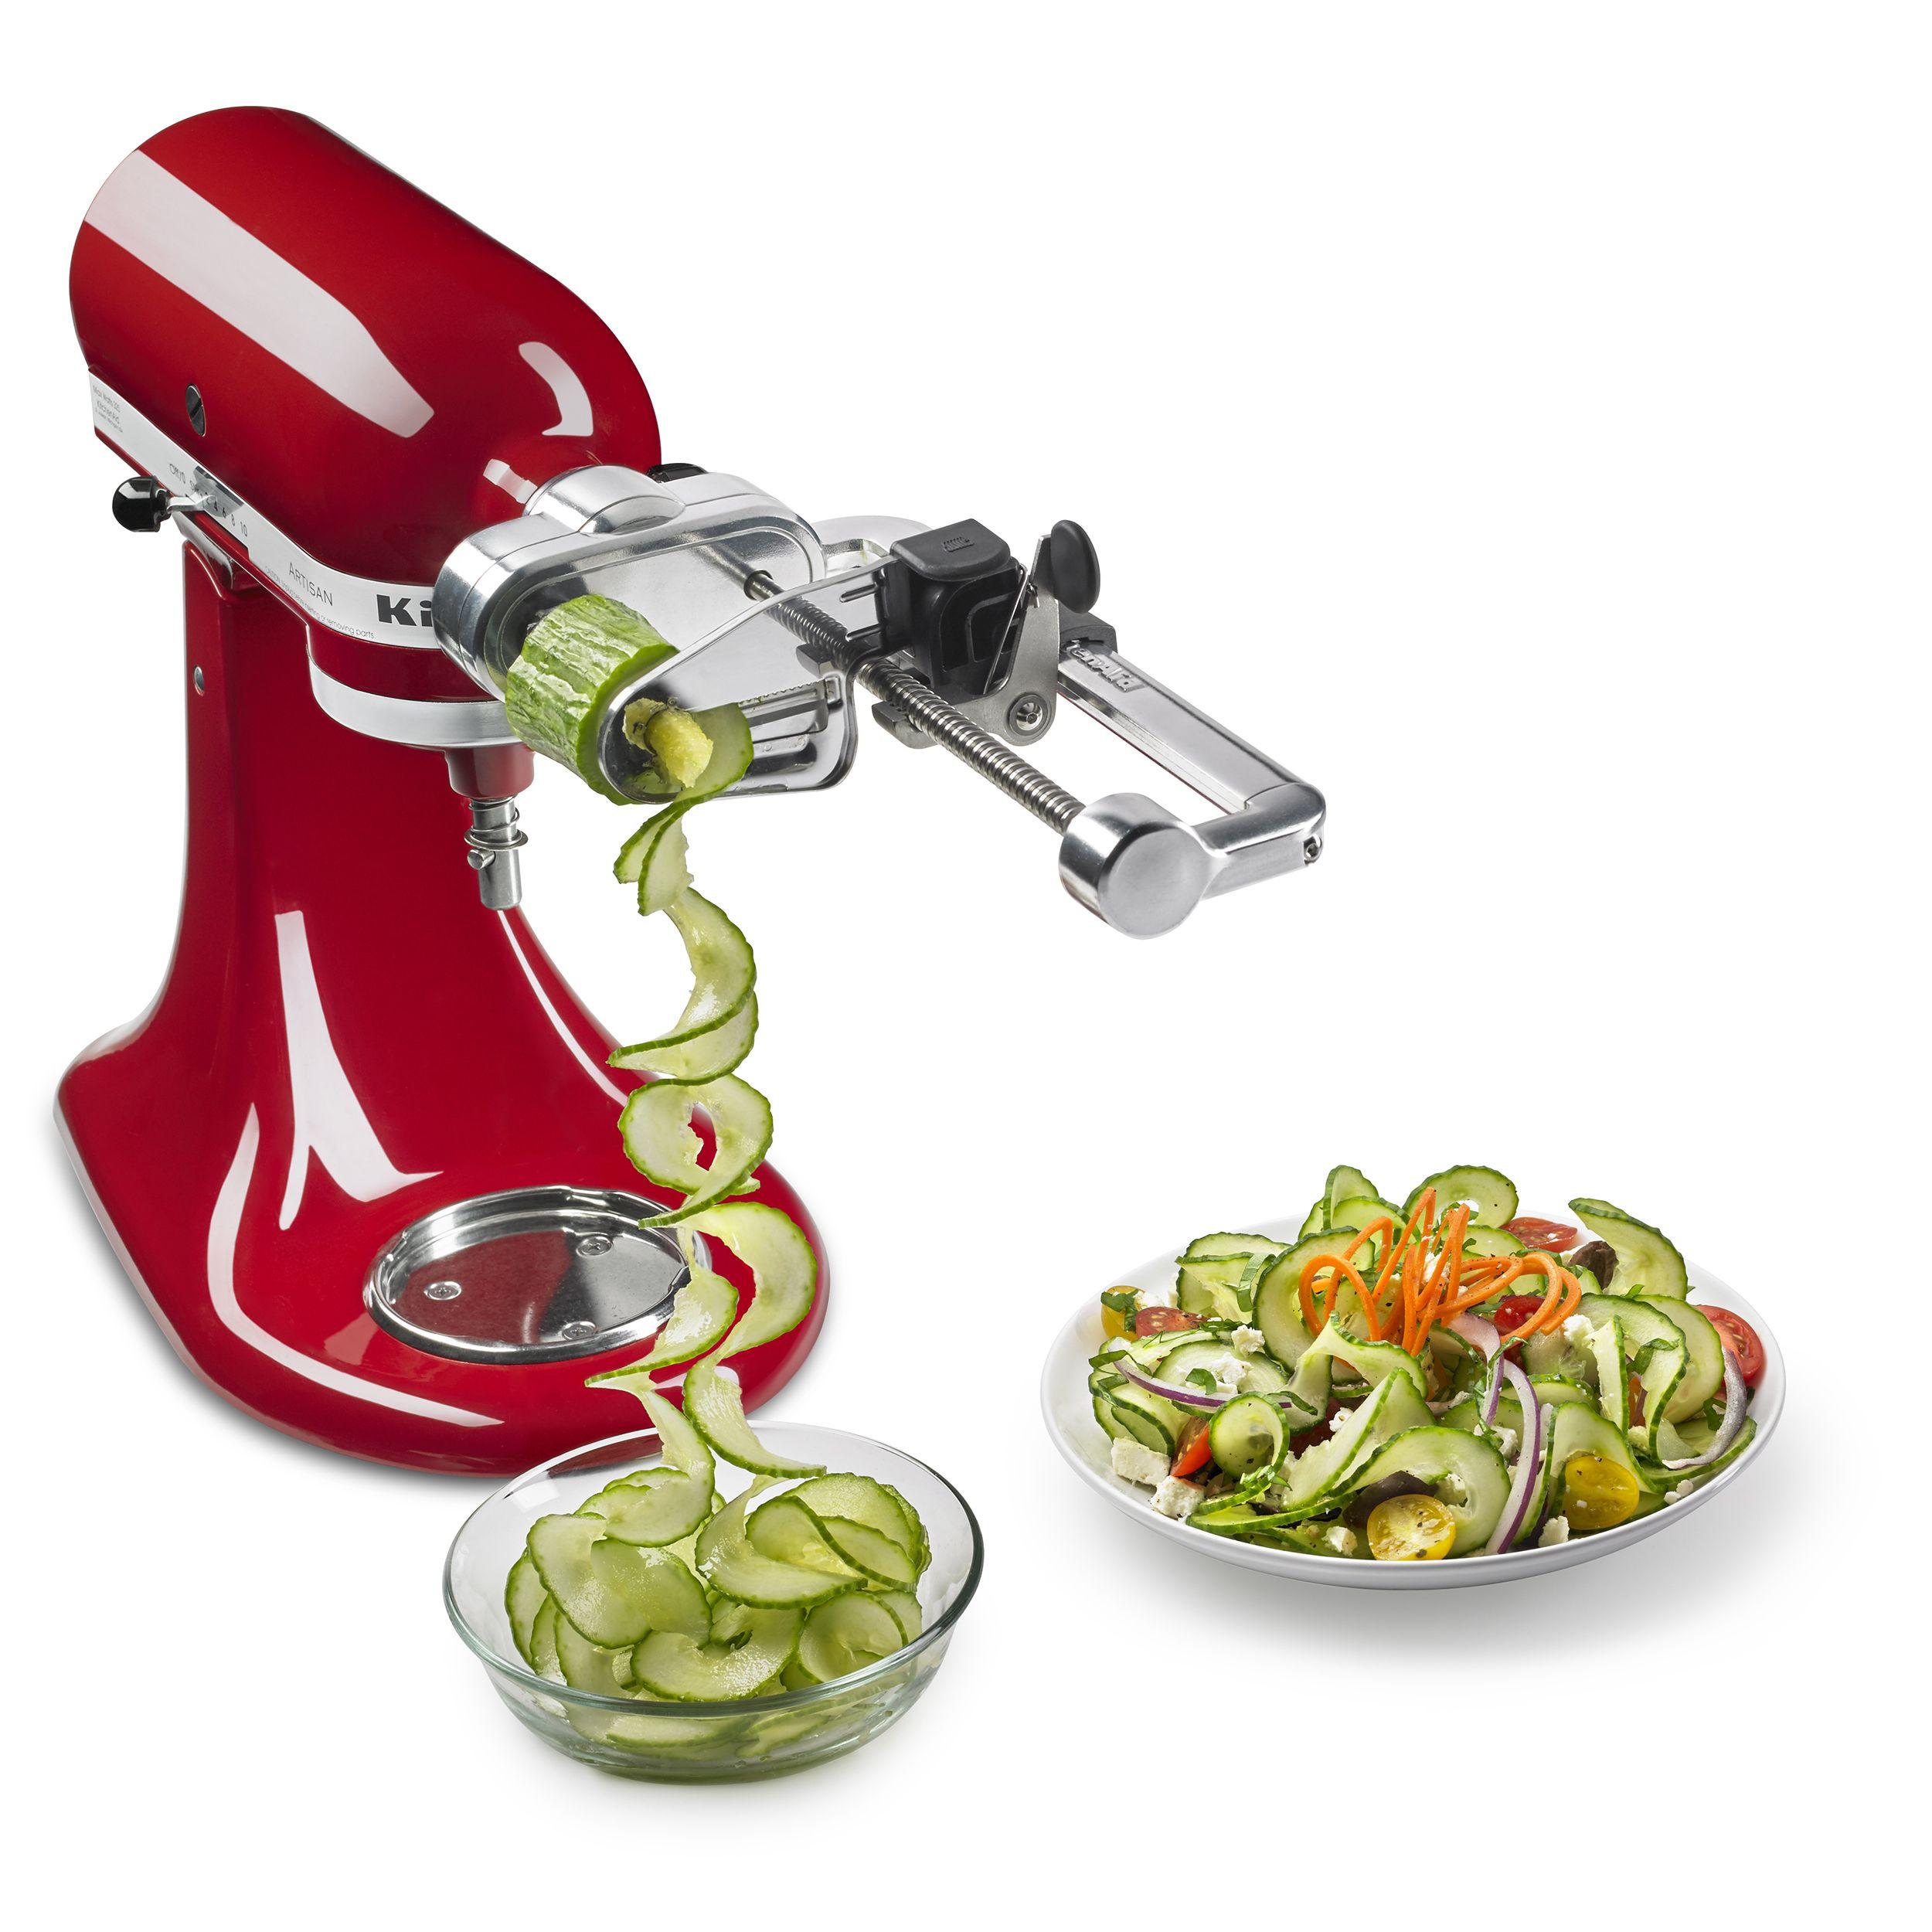 Home kitchenaid stand mixer kitchen aid mixer